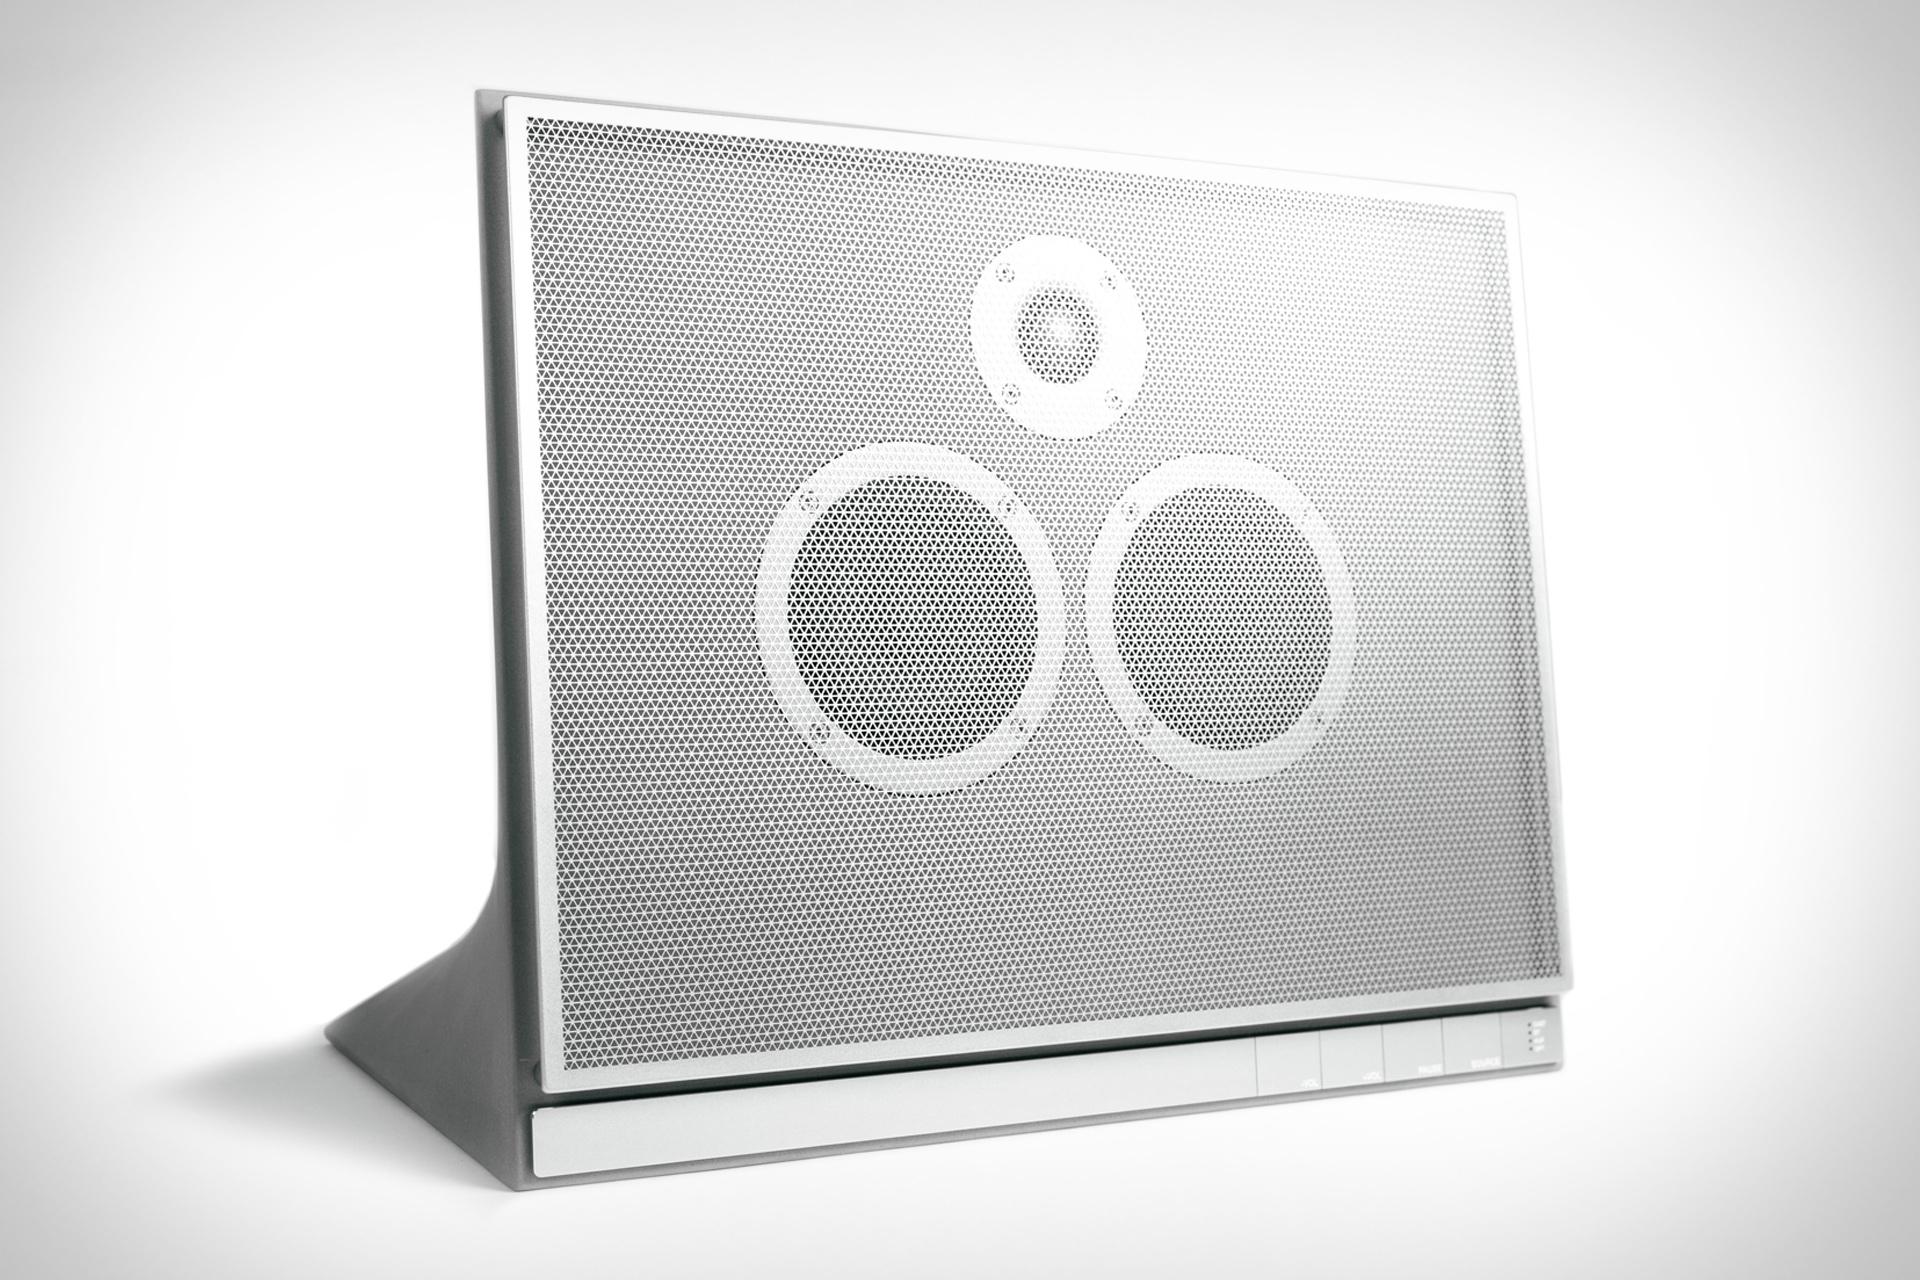 Master & Dynamic MA770 Wireless Speaker